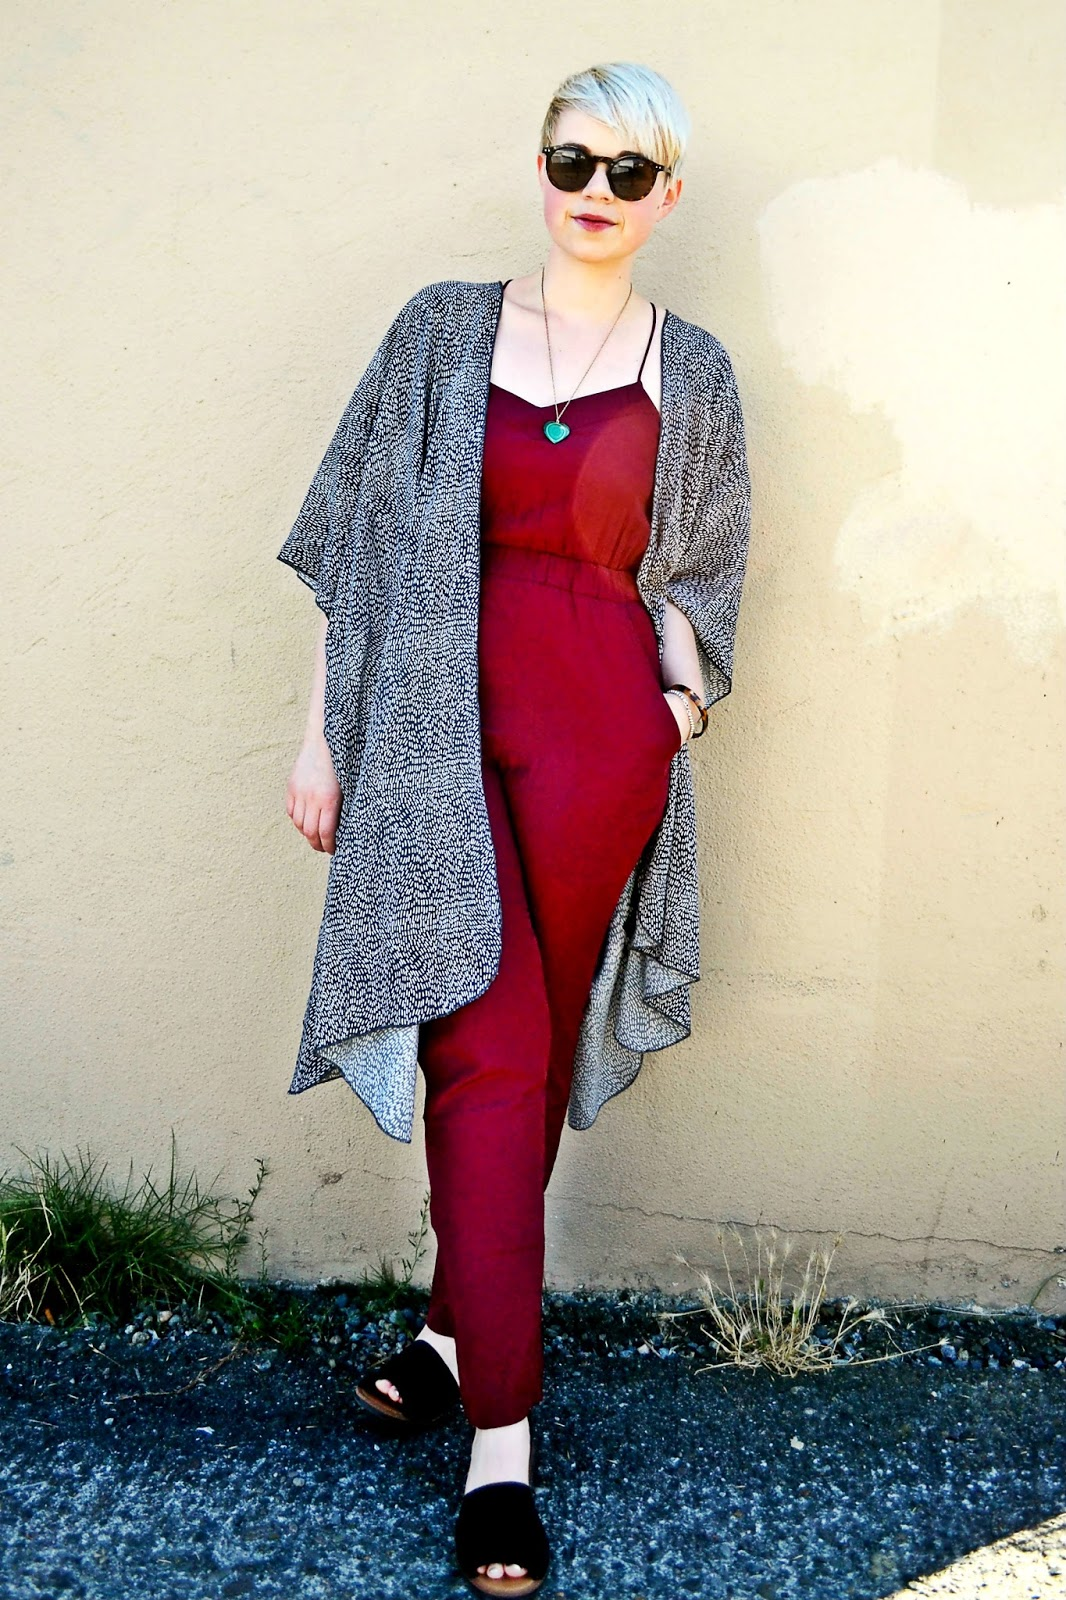 jewel tones, fall fashion, kimono, outfit ideas, look of the day, fleur d'elise, oasap, seattle, street style